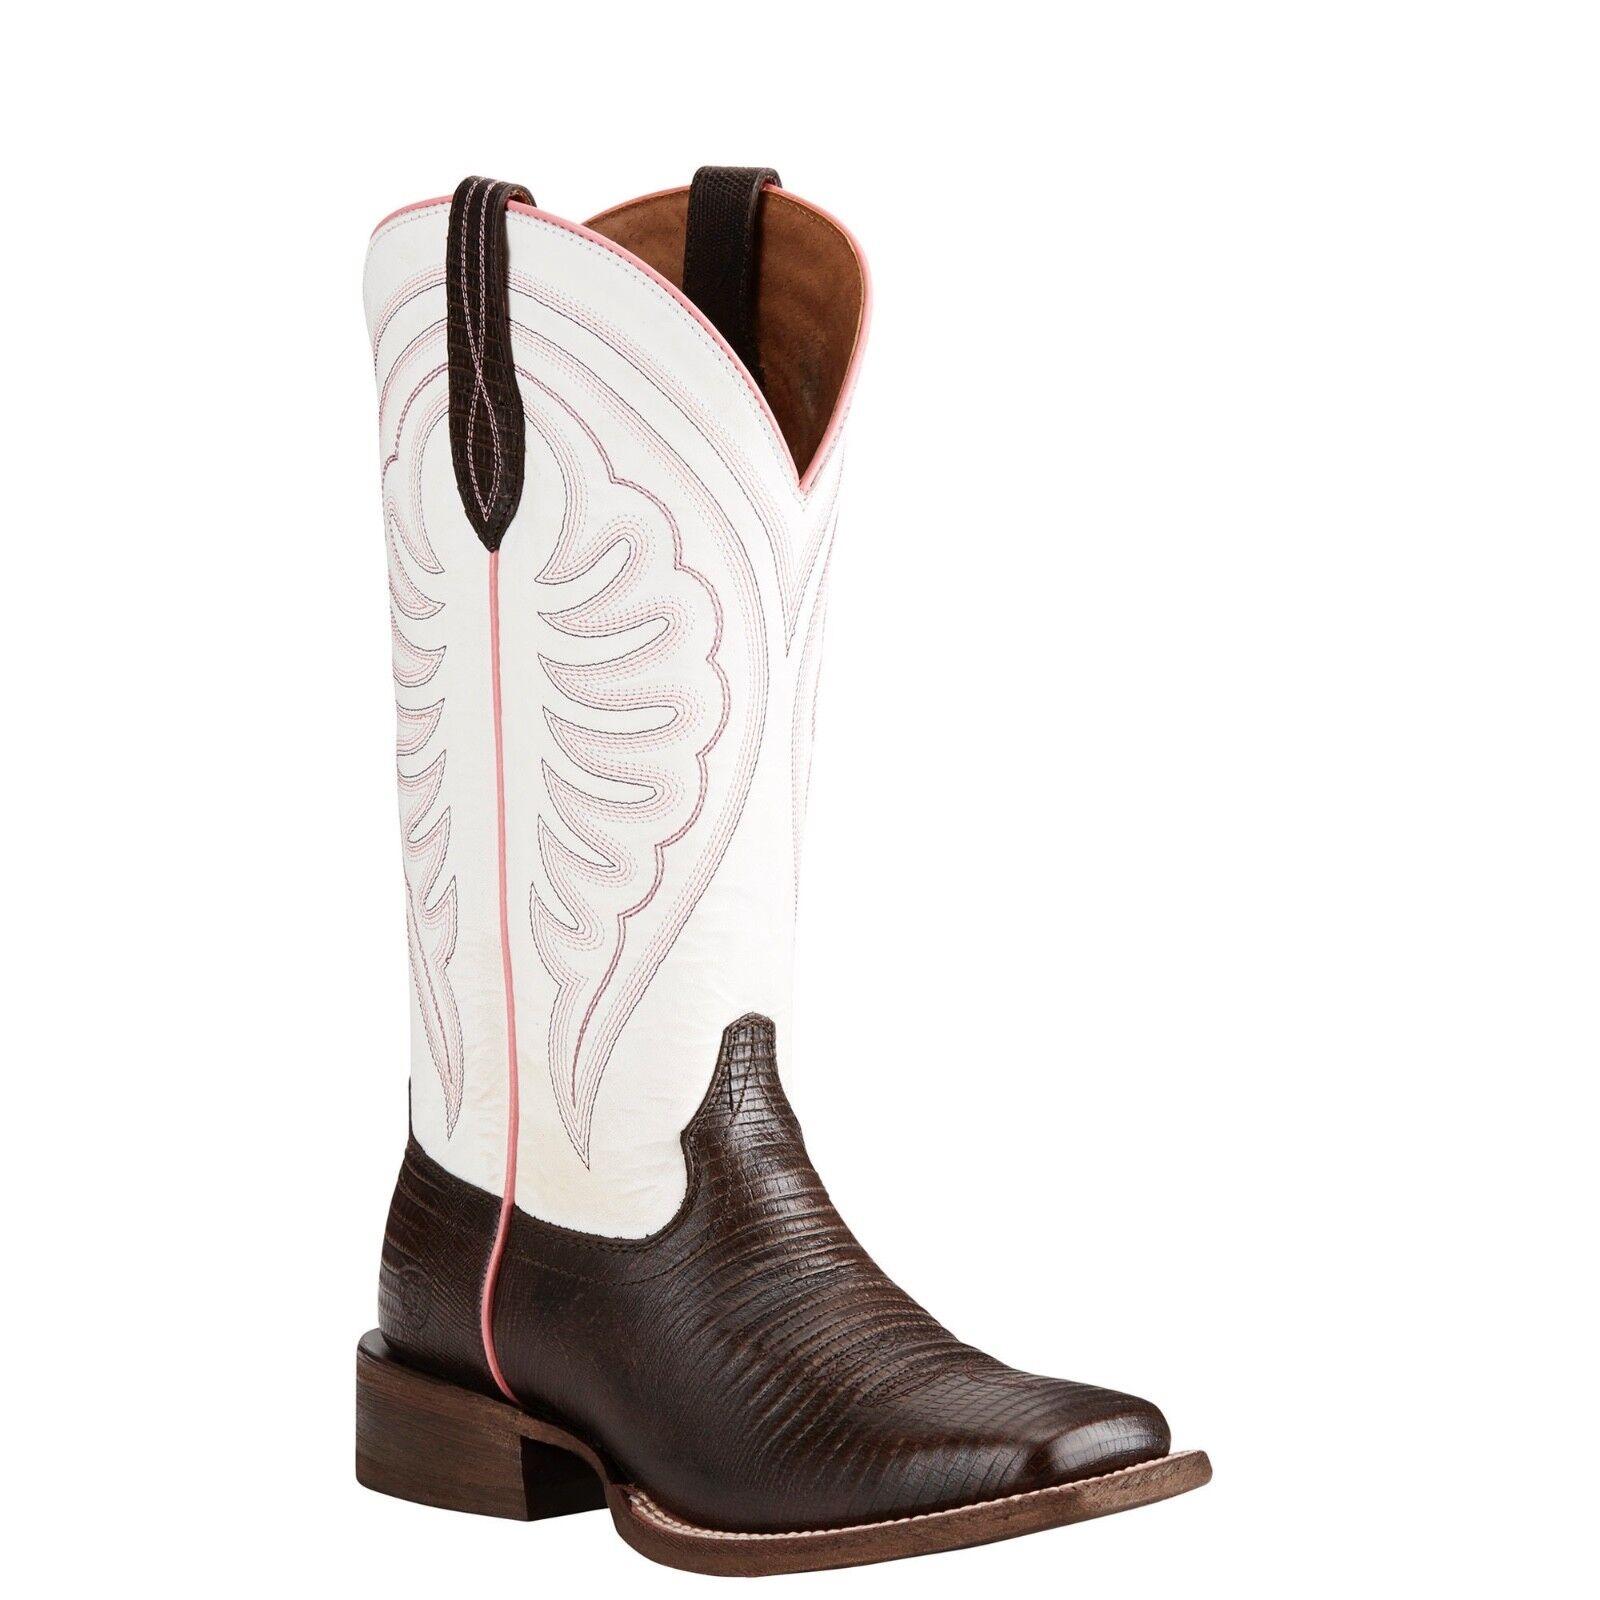 Ariat® Ladies Circuit Shiloh Brown Lizard Print & White Boots 10021611